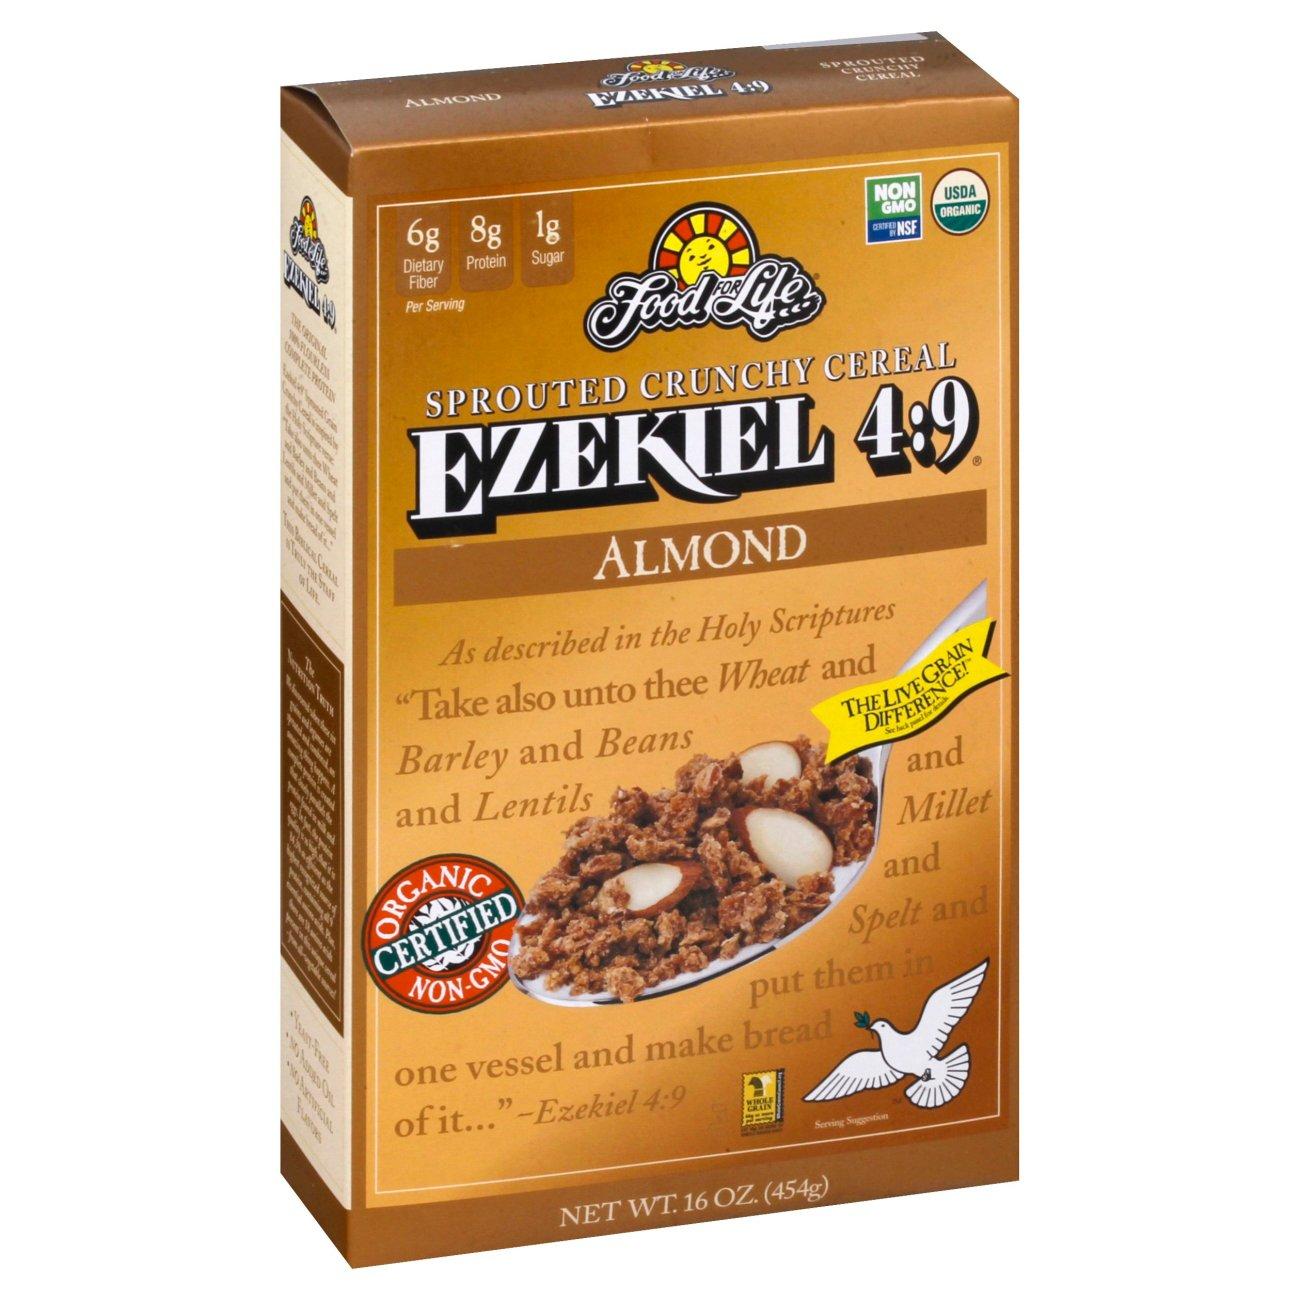 Food For Life Ezekiel 4:9 Almond Cereal